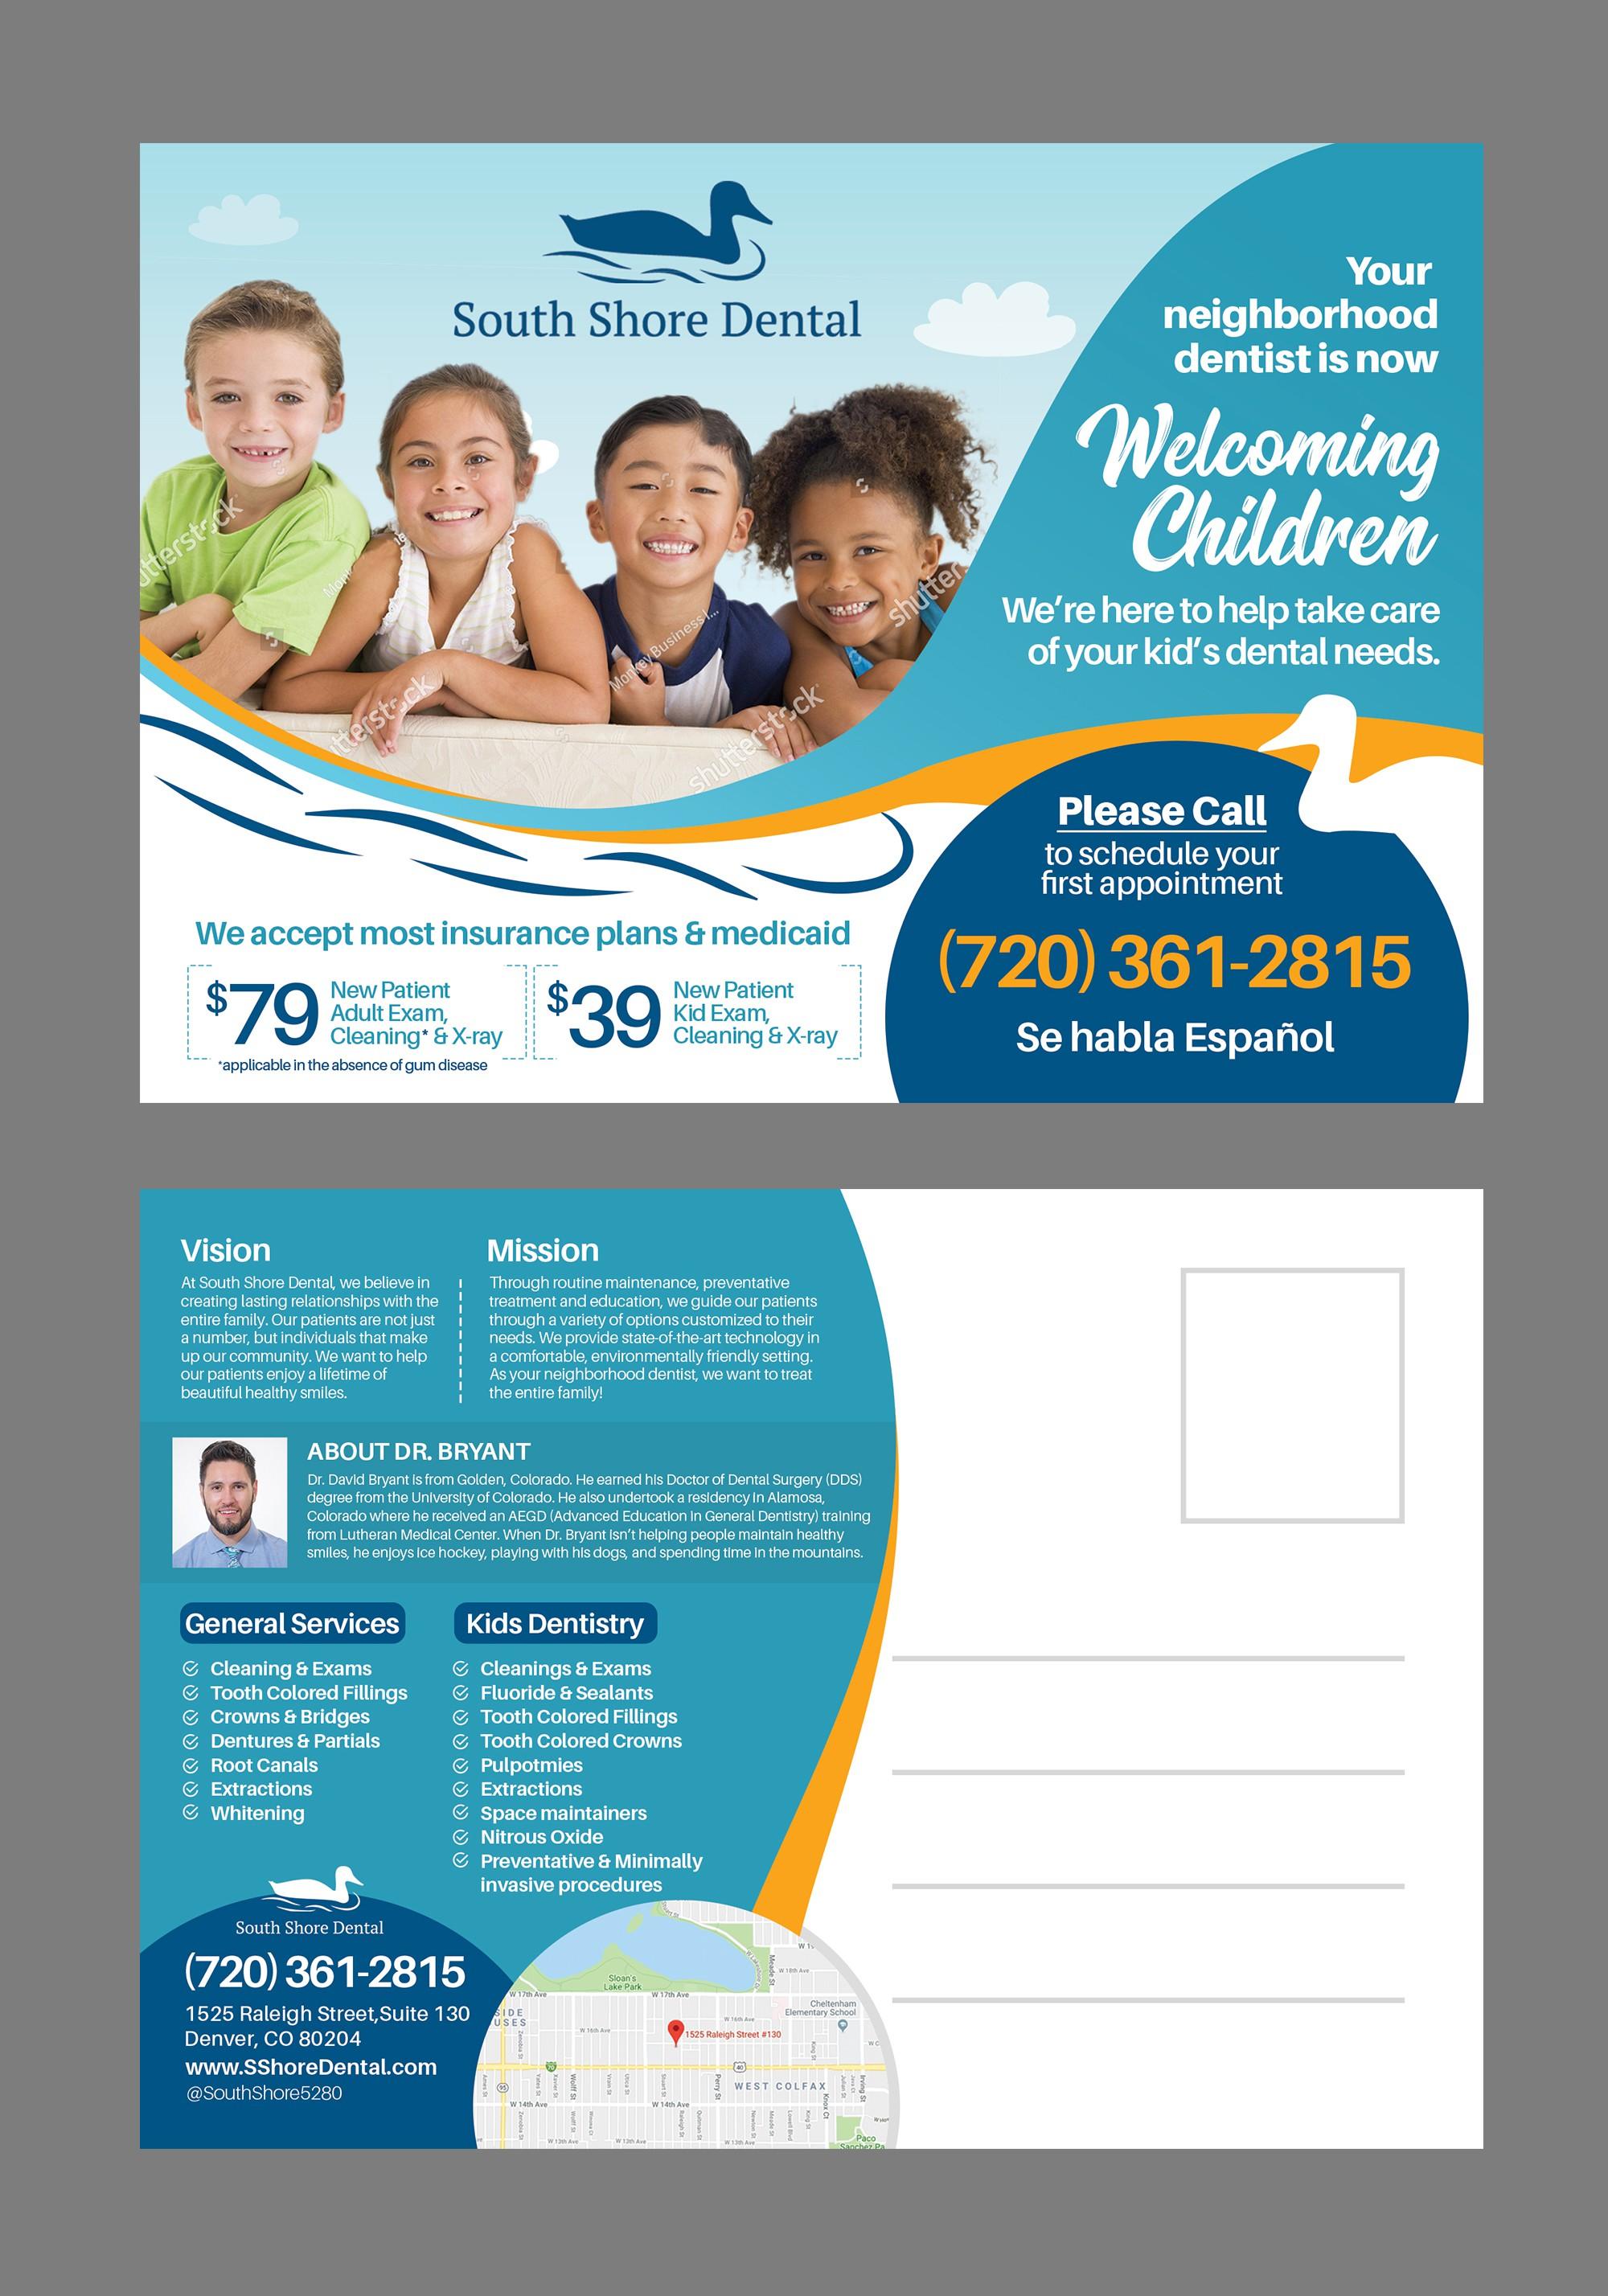 Mellow dental office wants fun mailer for new children dental division